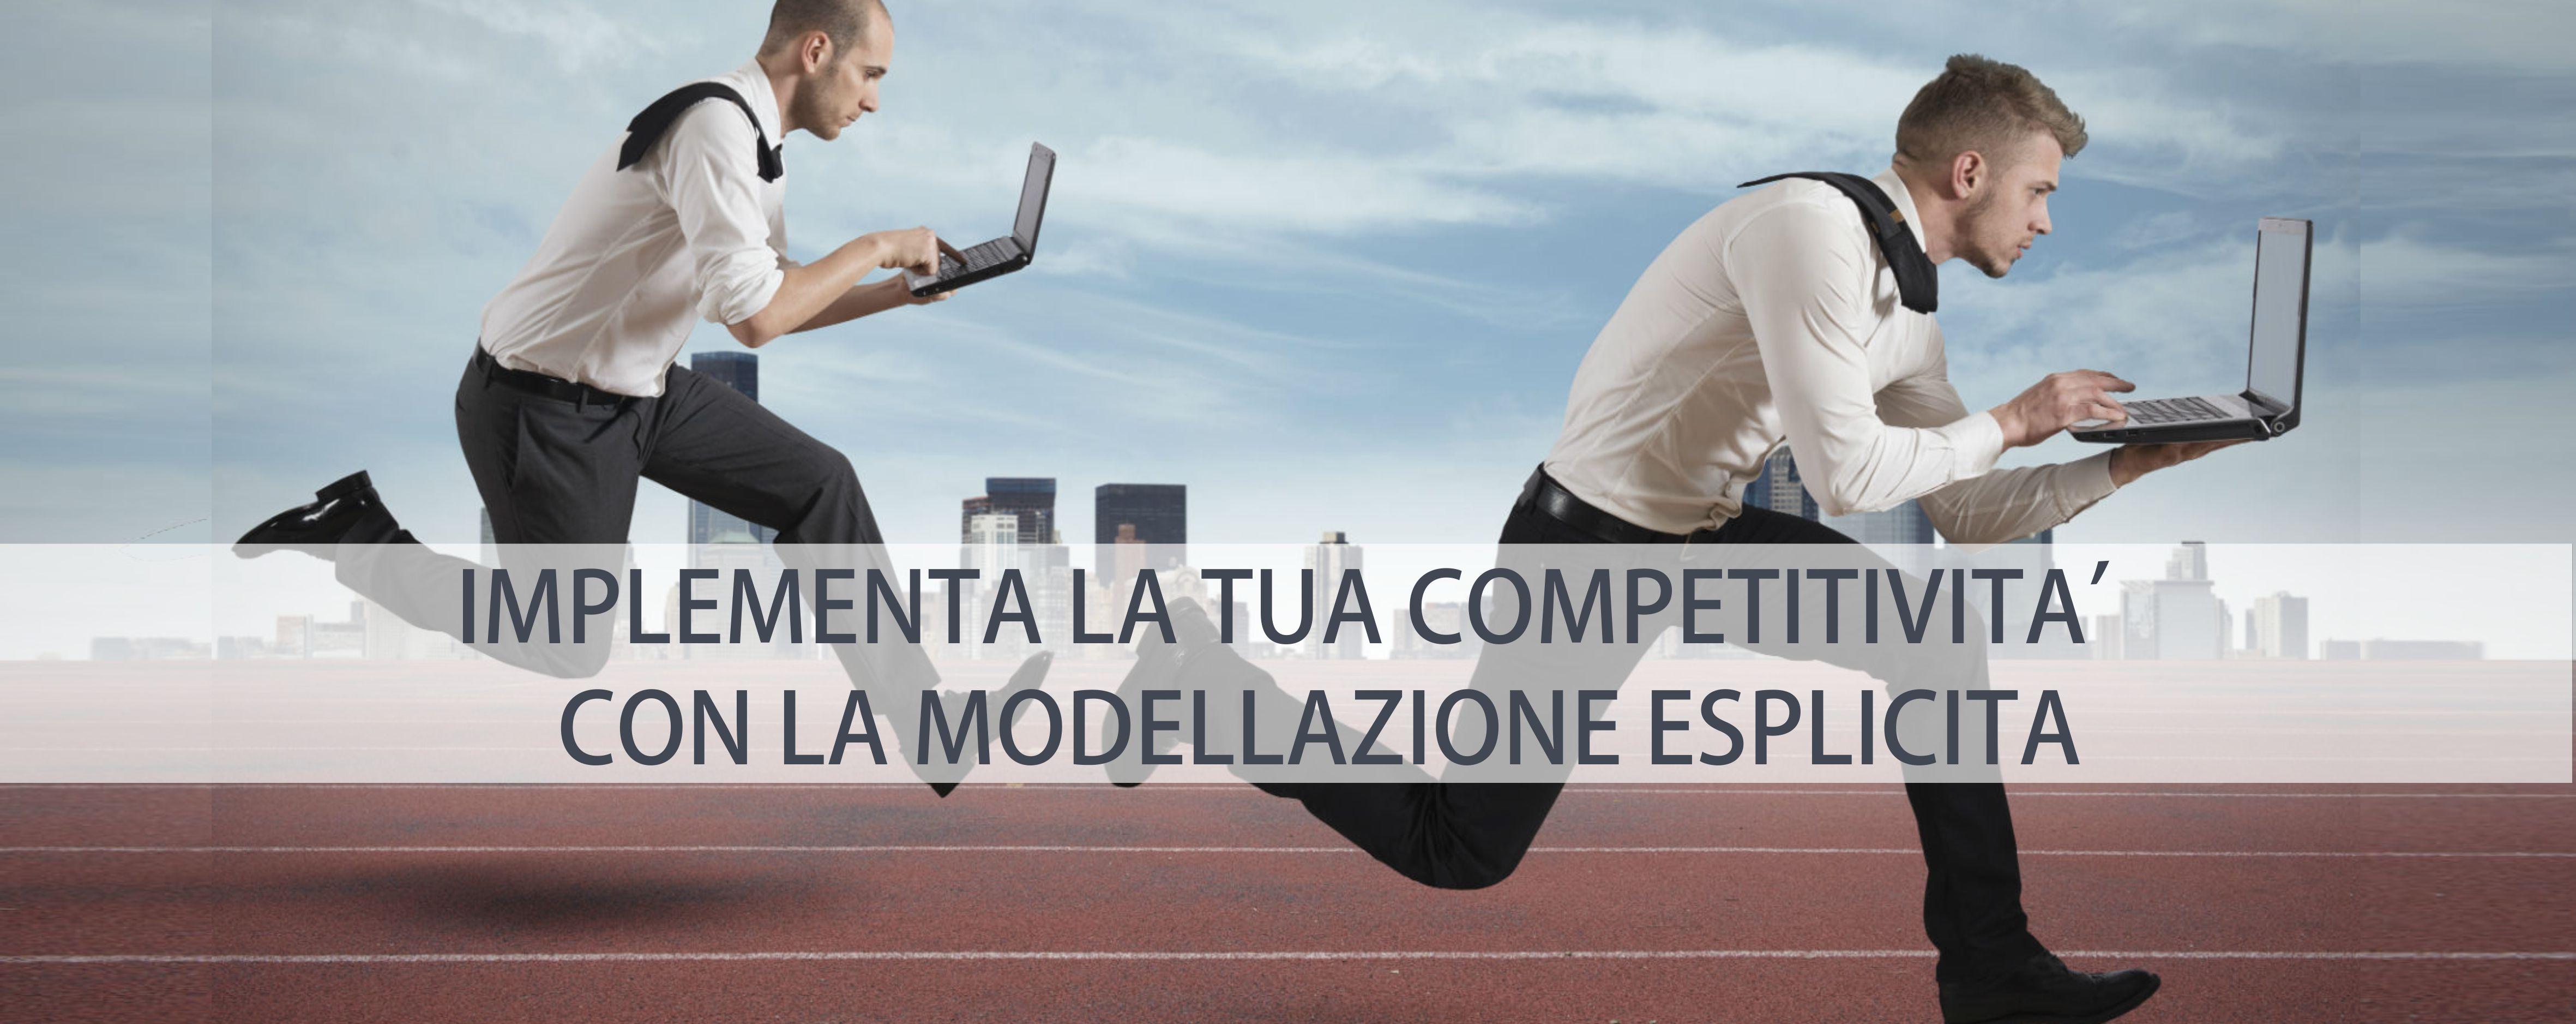 banner-competitive-uomini4